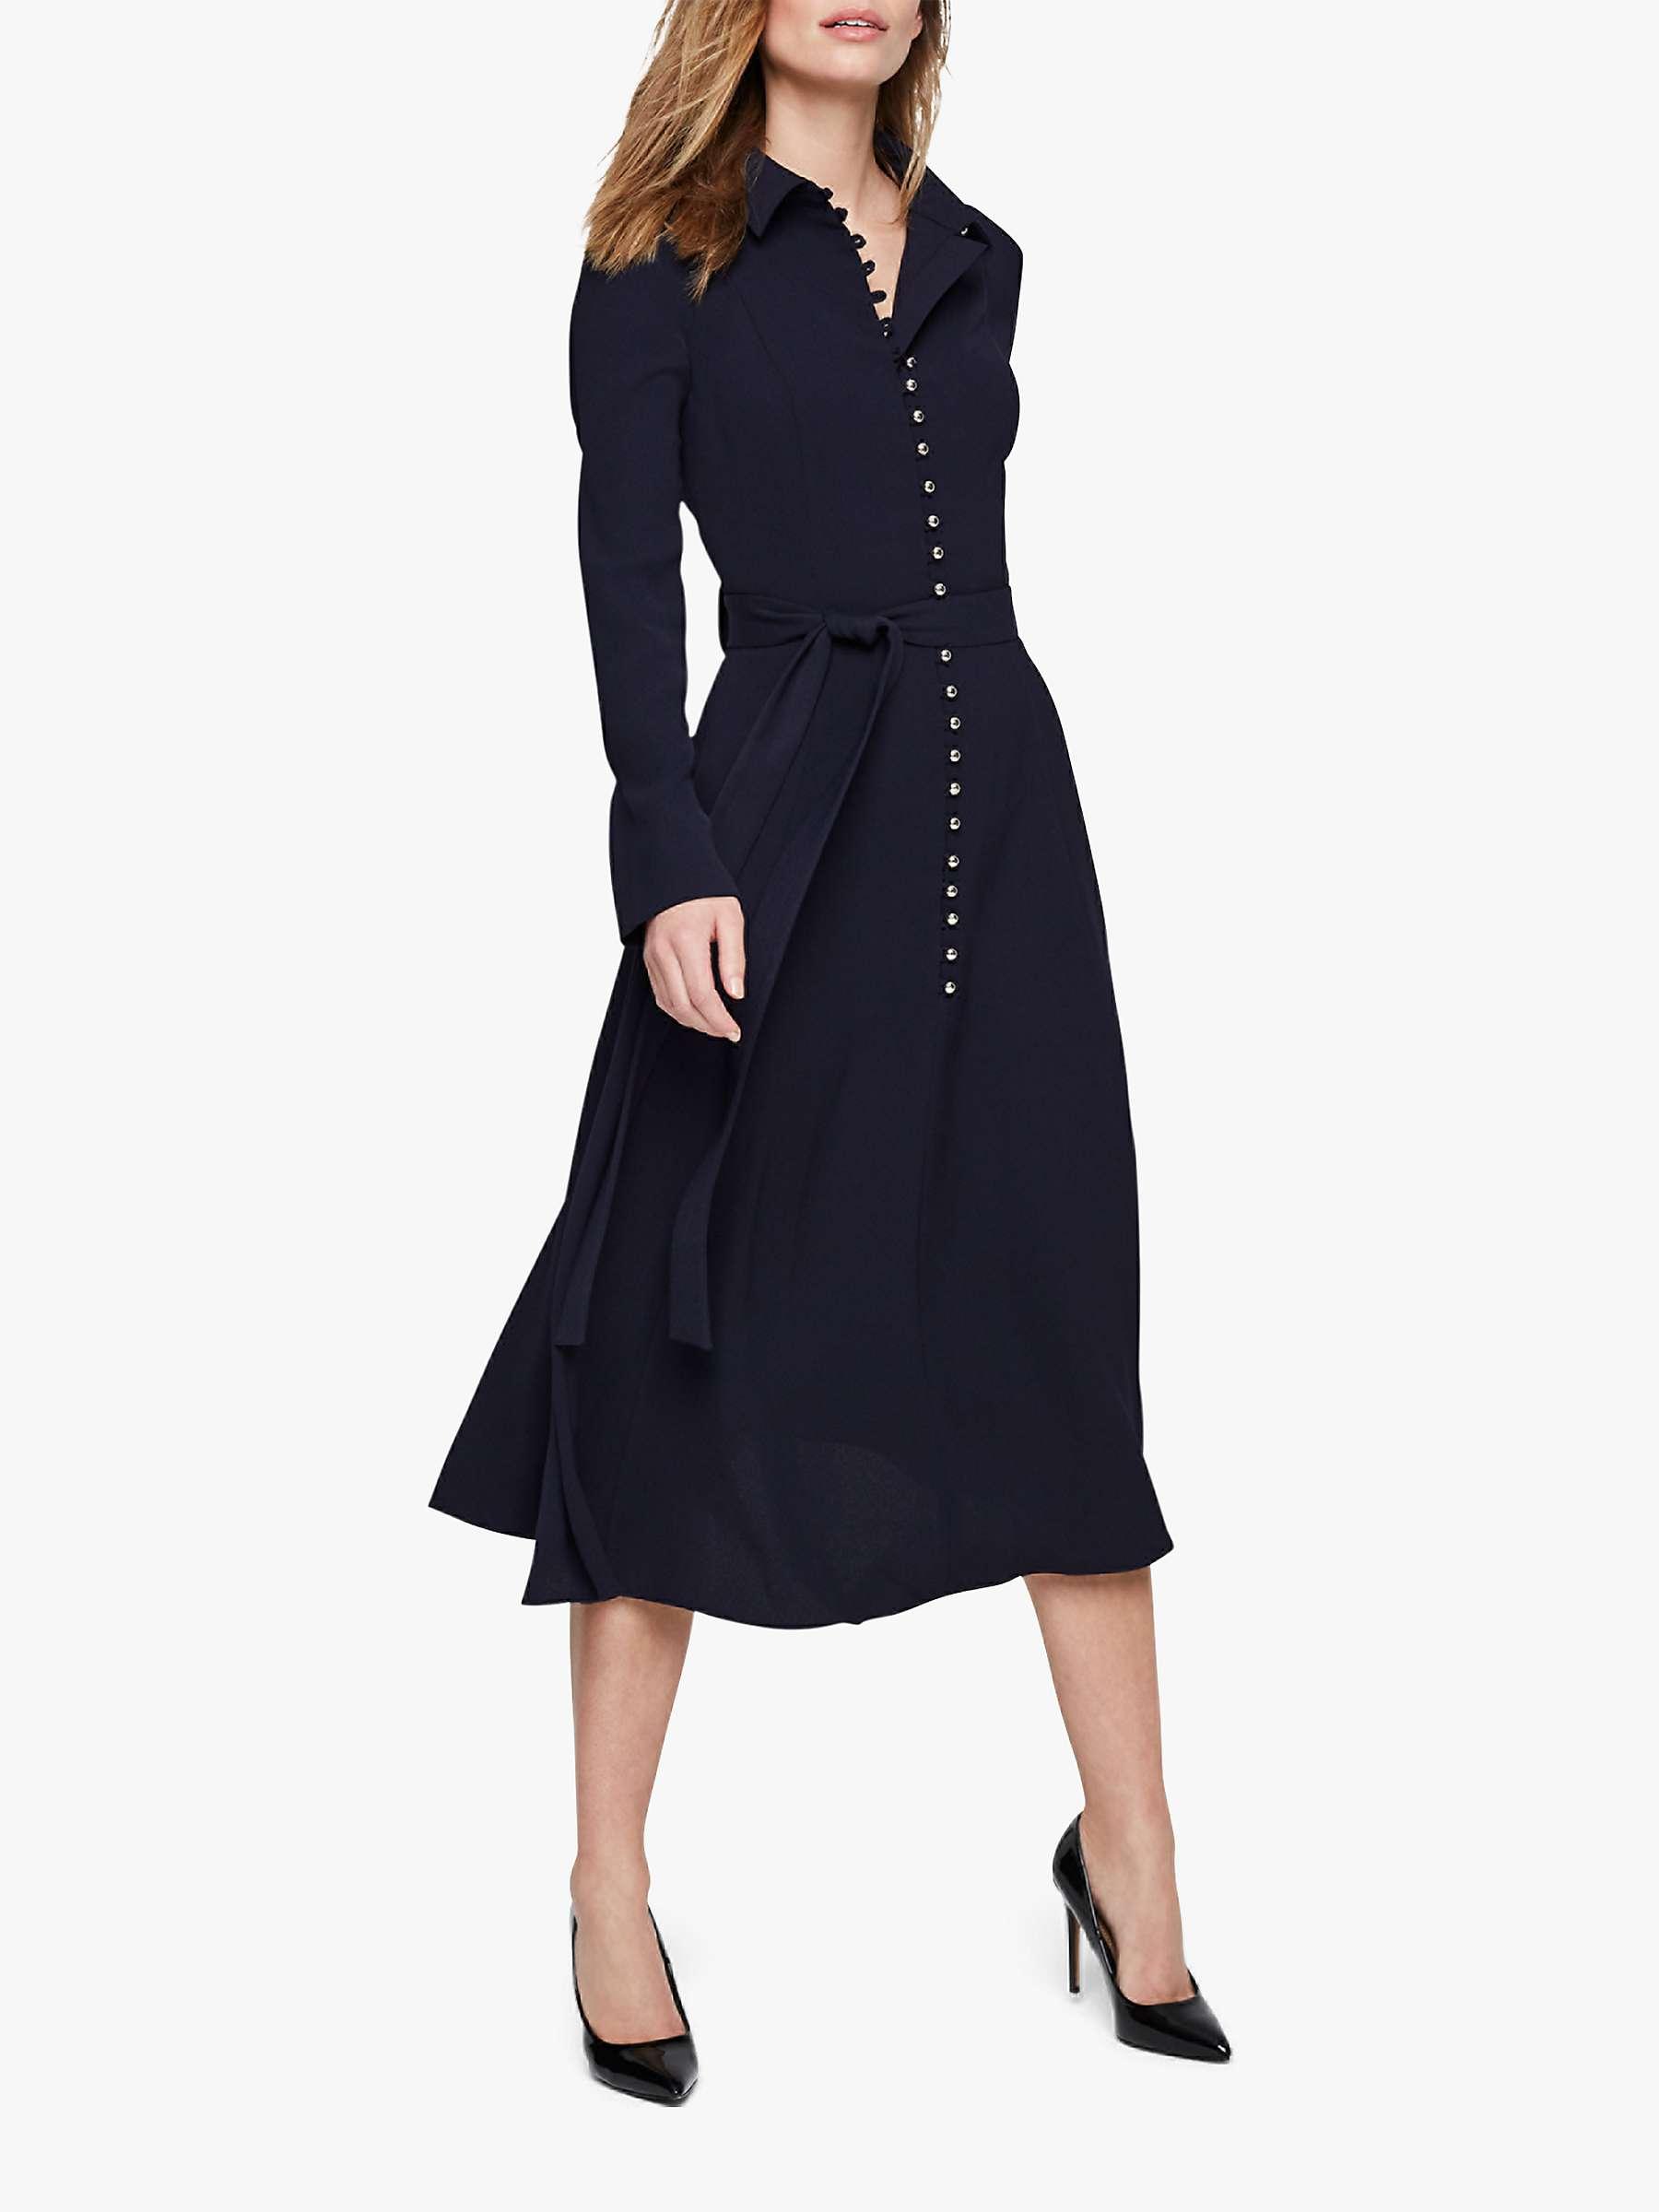 Damsel In A Dress Lanie Military Dress, Navy by John Lewis